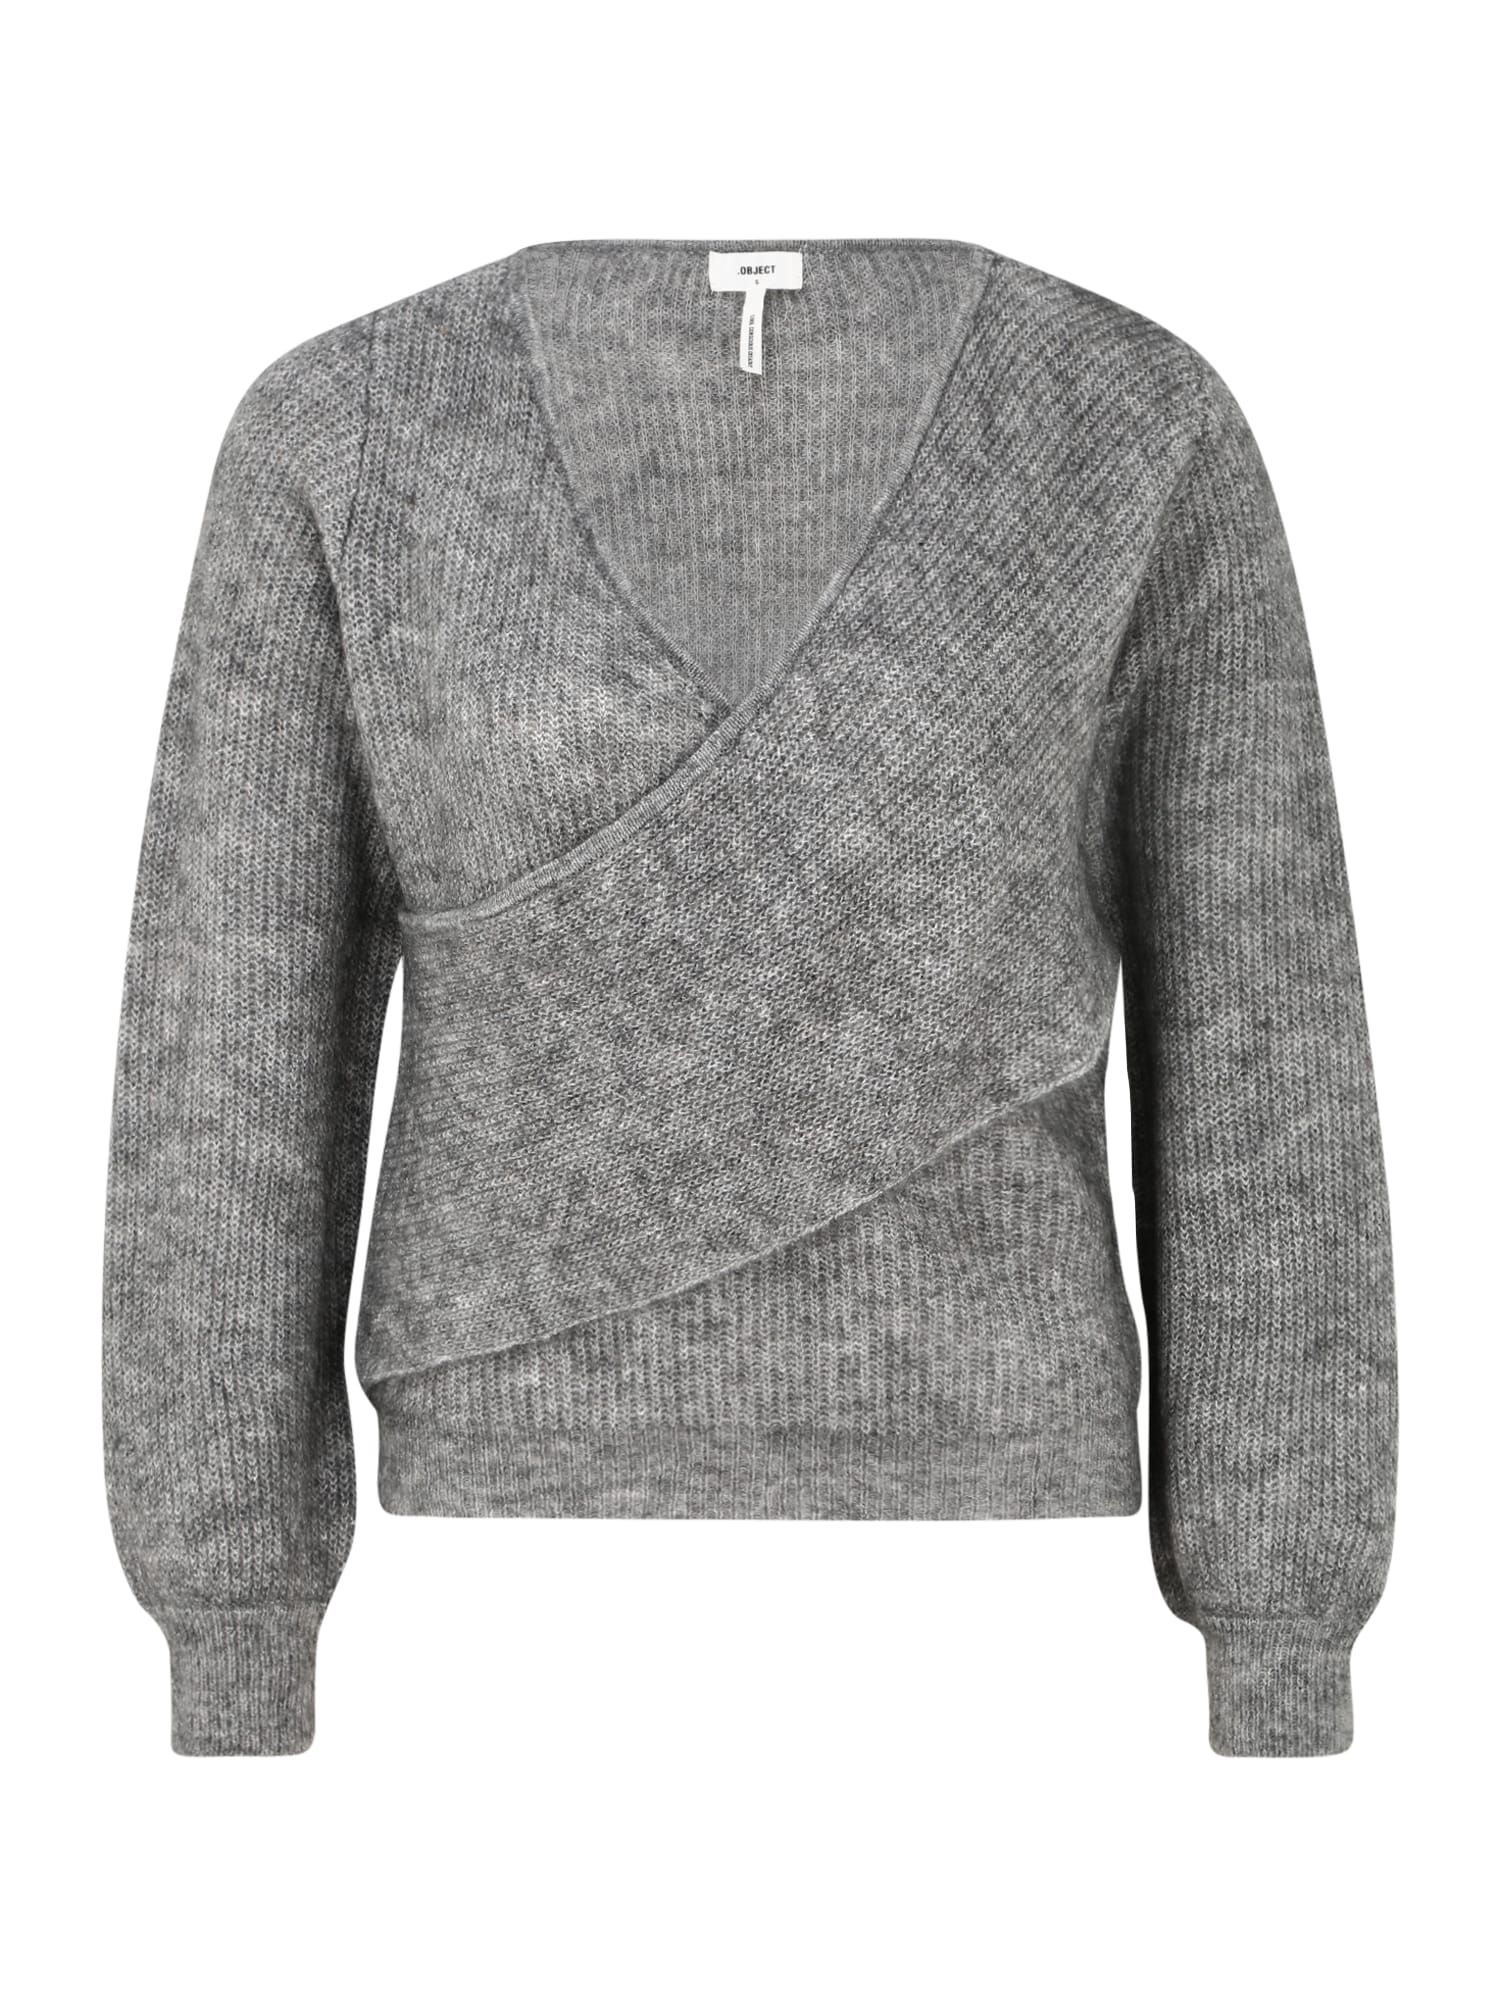 OBJECT (Petite) Megztinis margai pilka